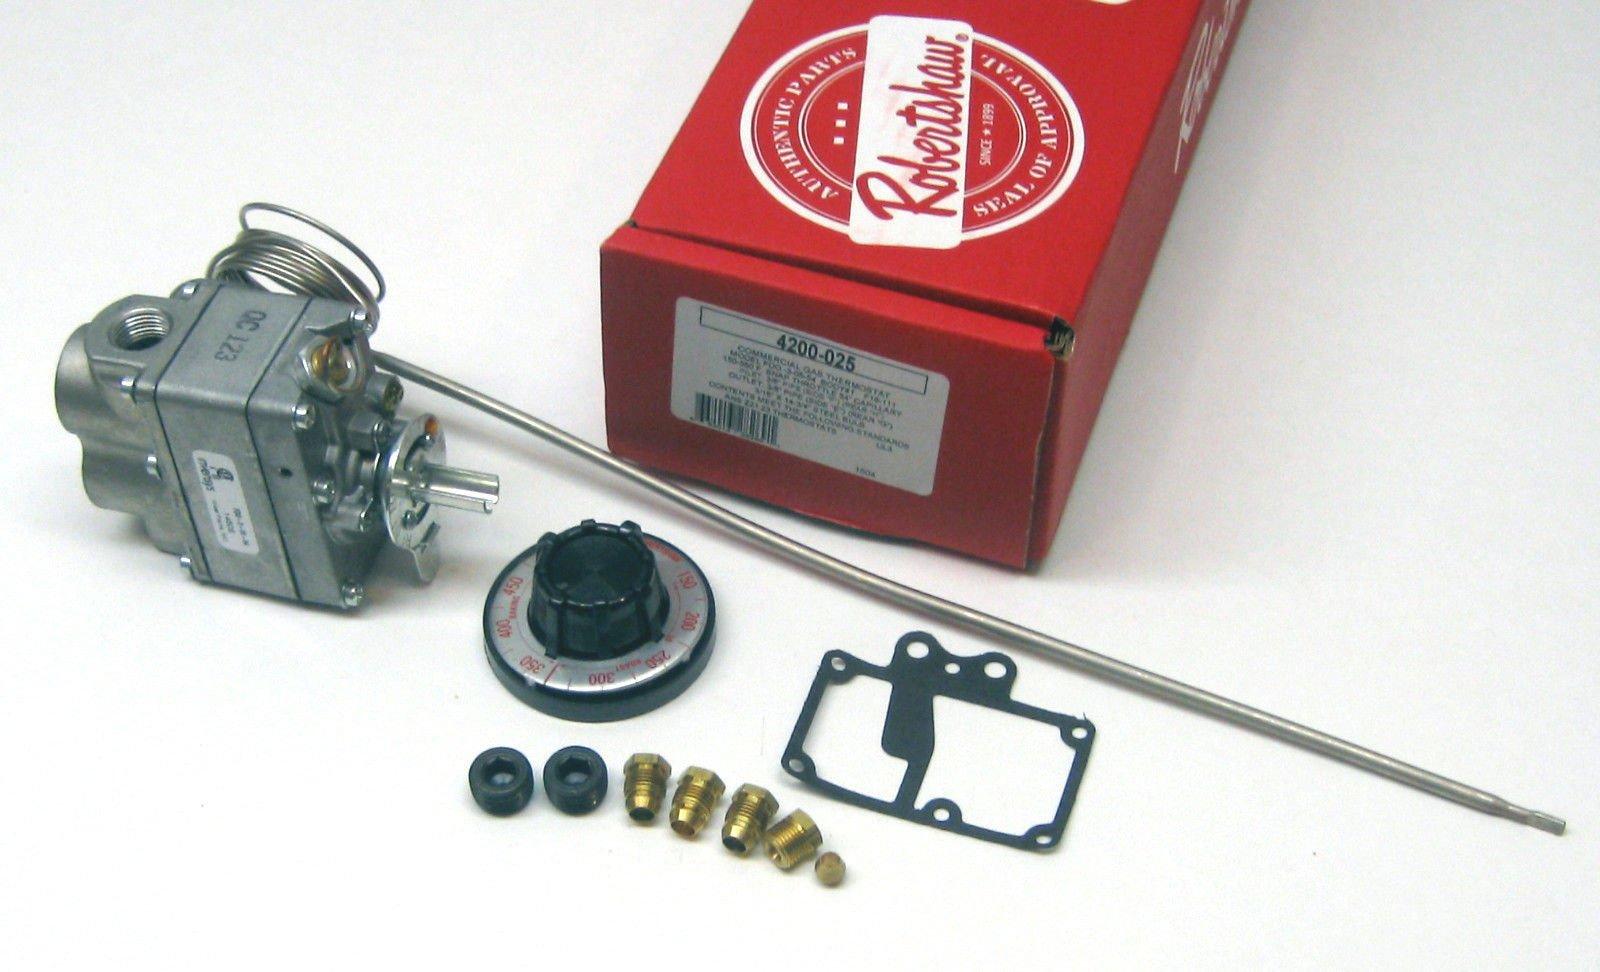 Robertshaw Product 4200-025 by Robertshaw